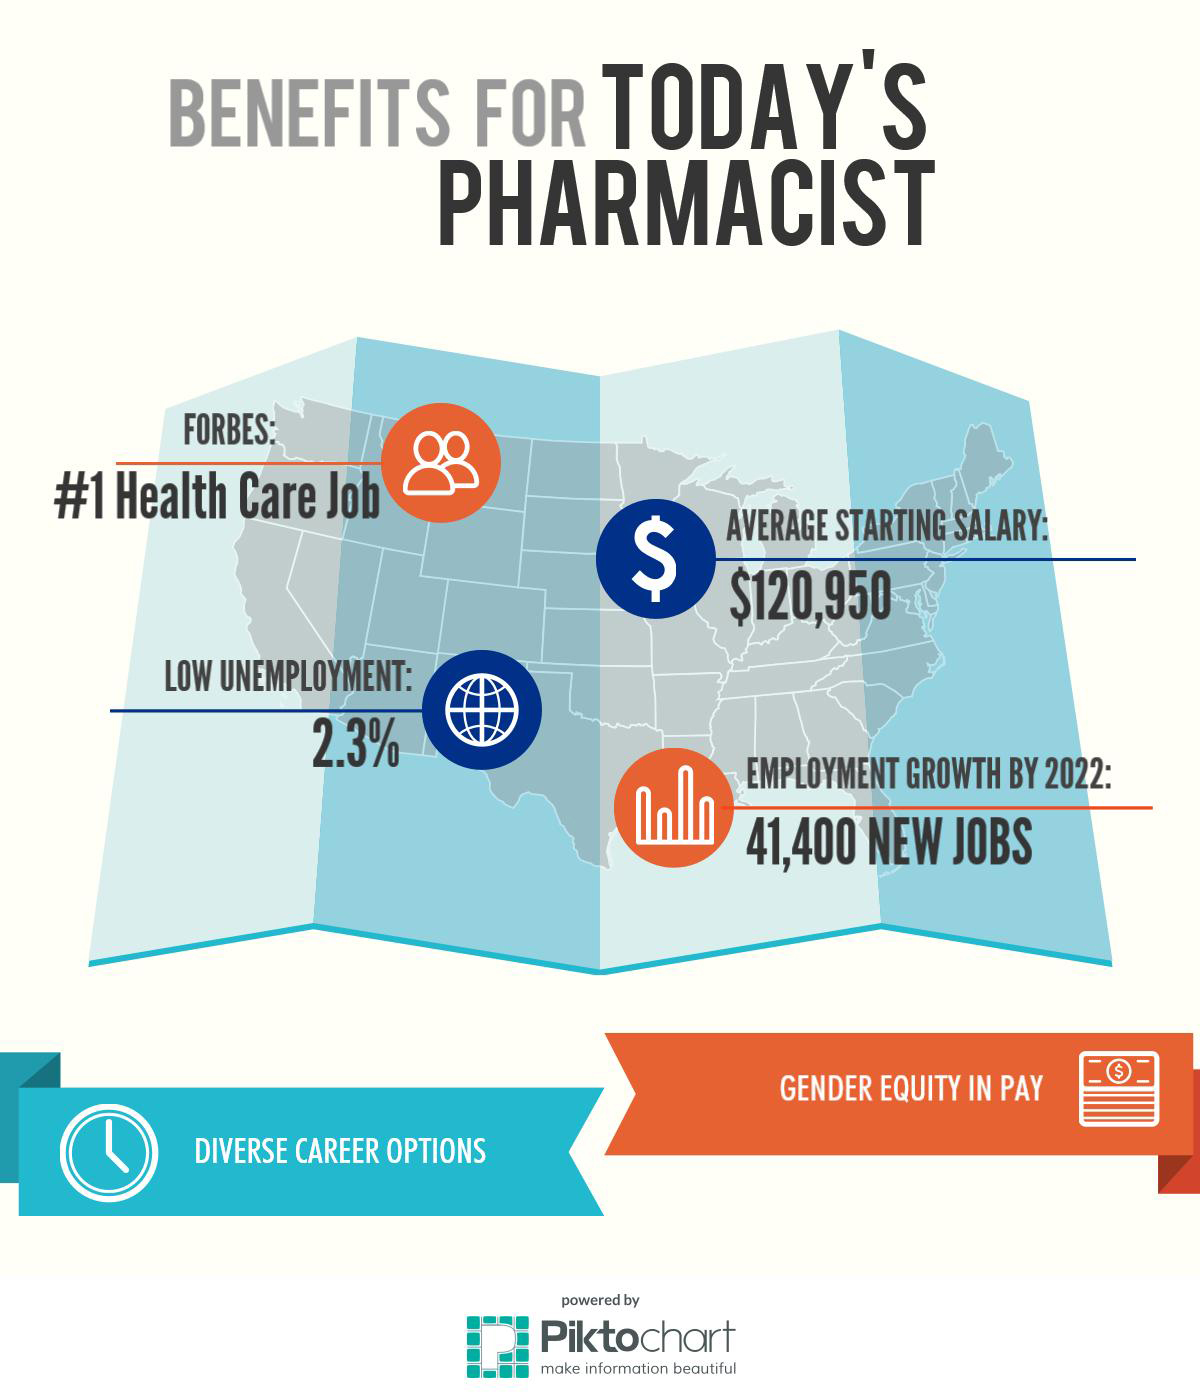 Today's Pharmacist(2) copy